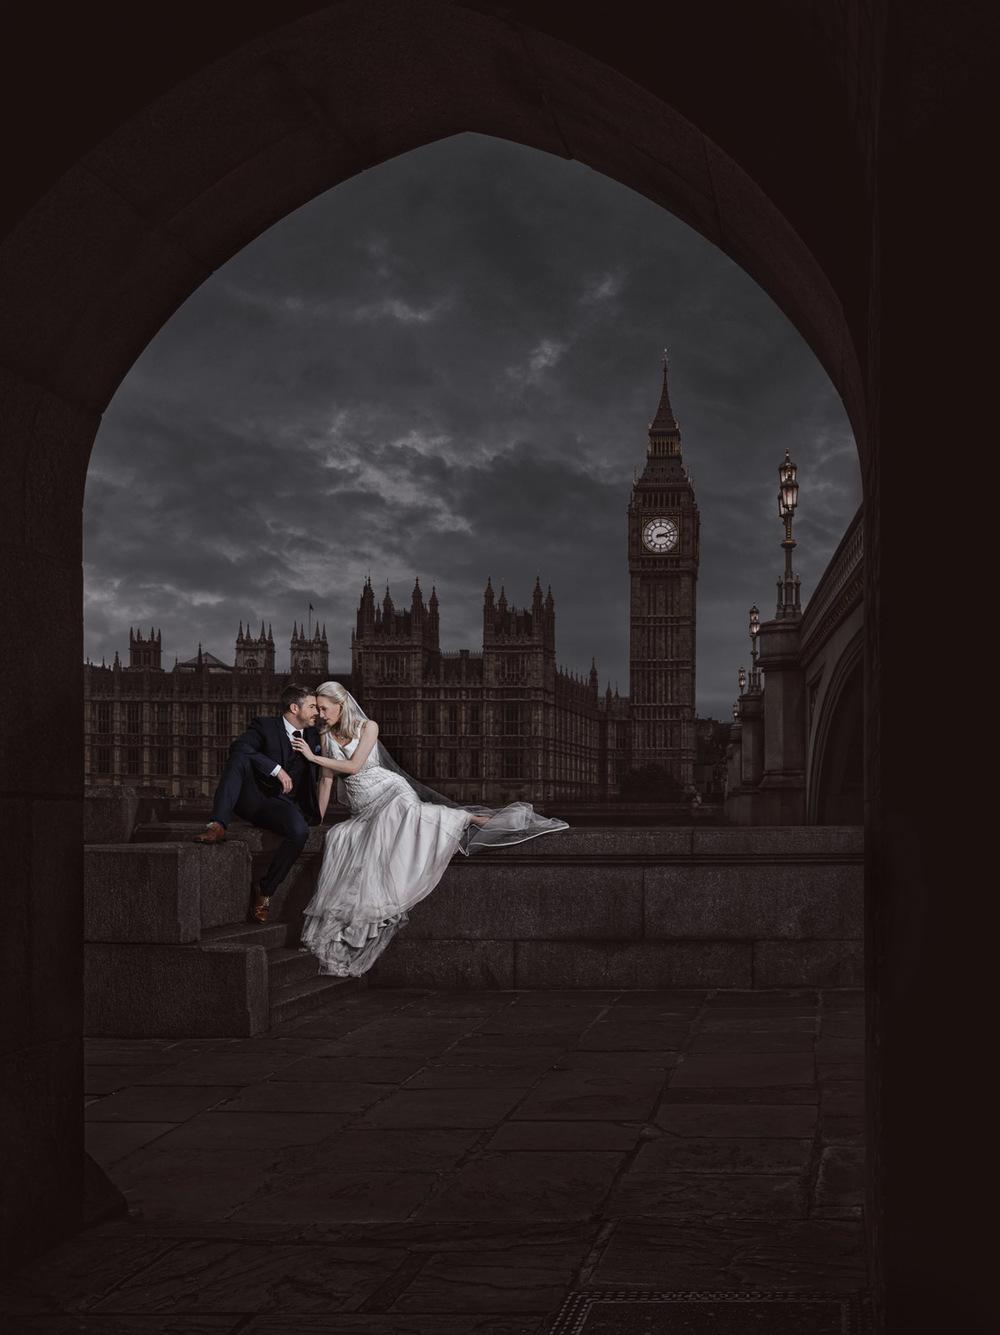 stlouis_wedding_photography_B0003909_Final.jpg